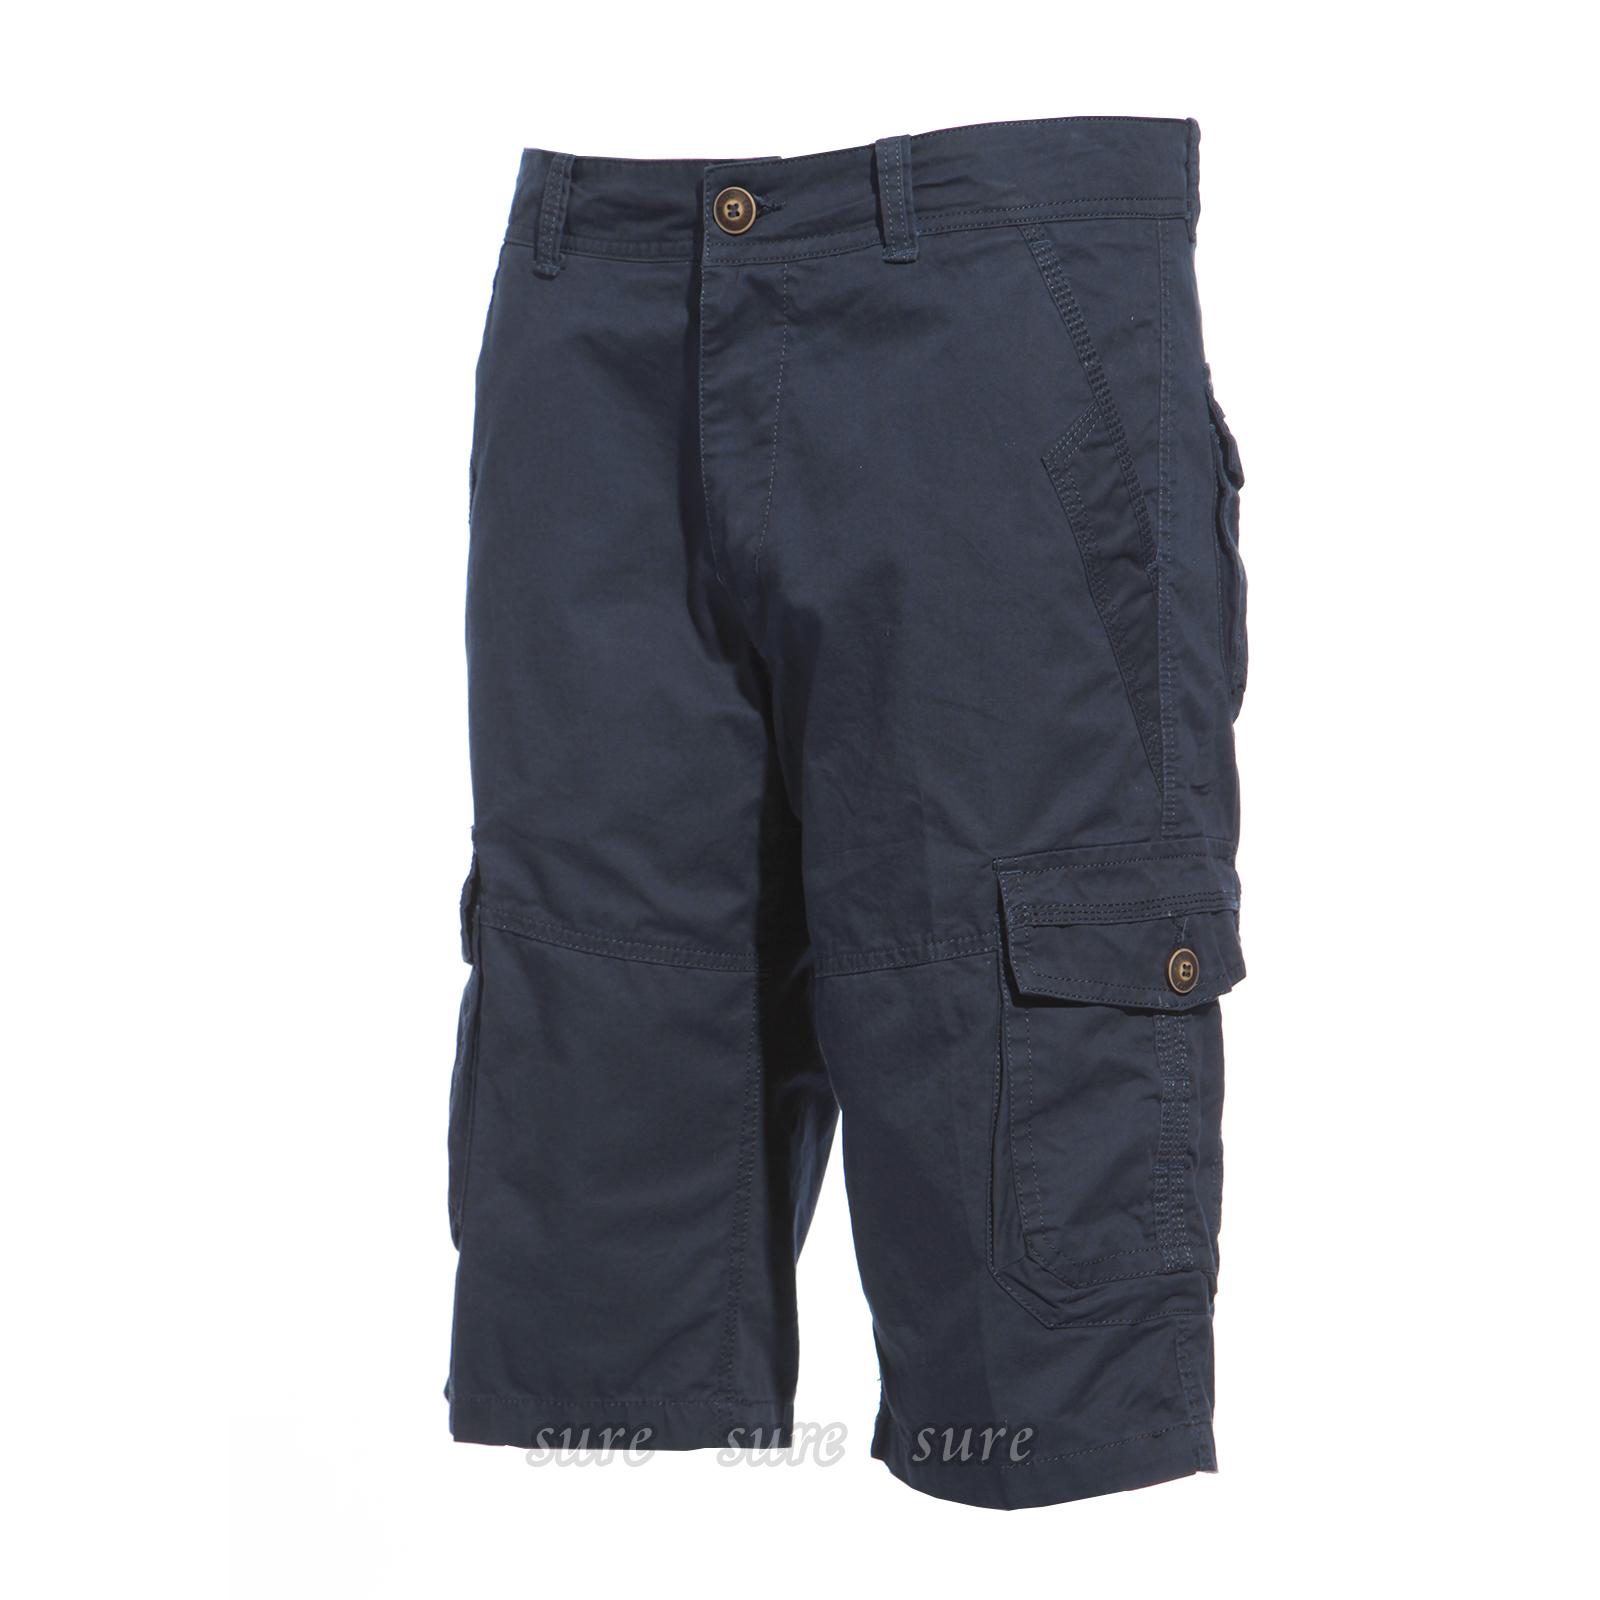 3 4 sommer kurze hose herren bermuda shorts strand hose cargoshorts chinoshorts ebay. Black Bedroom Furniture Sets. Home Design Ideas